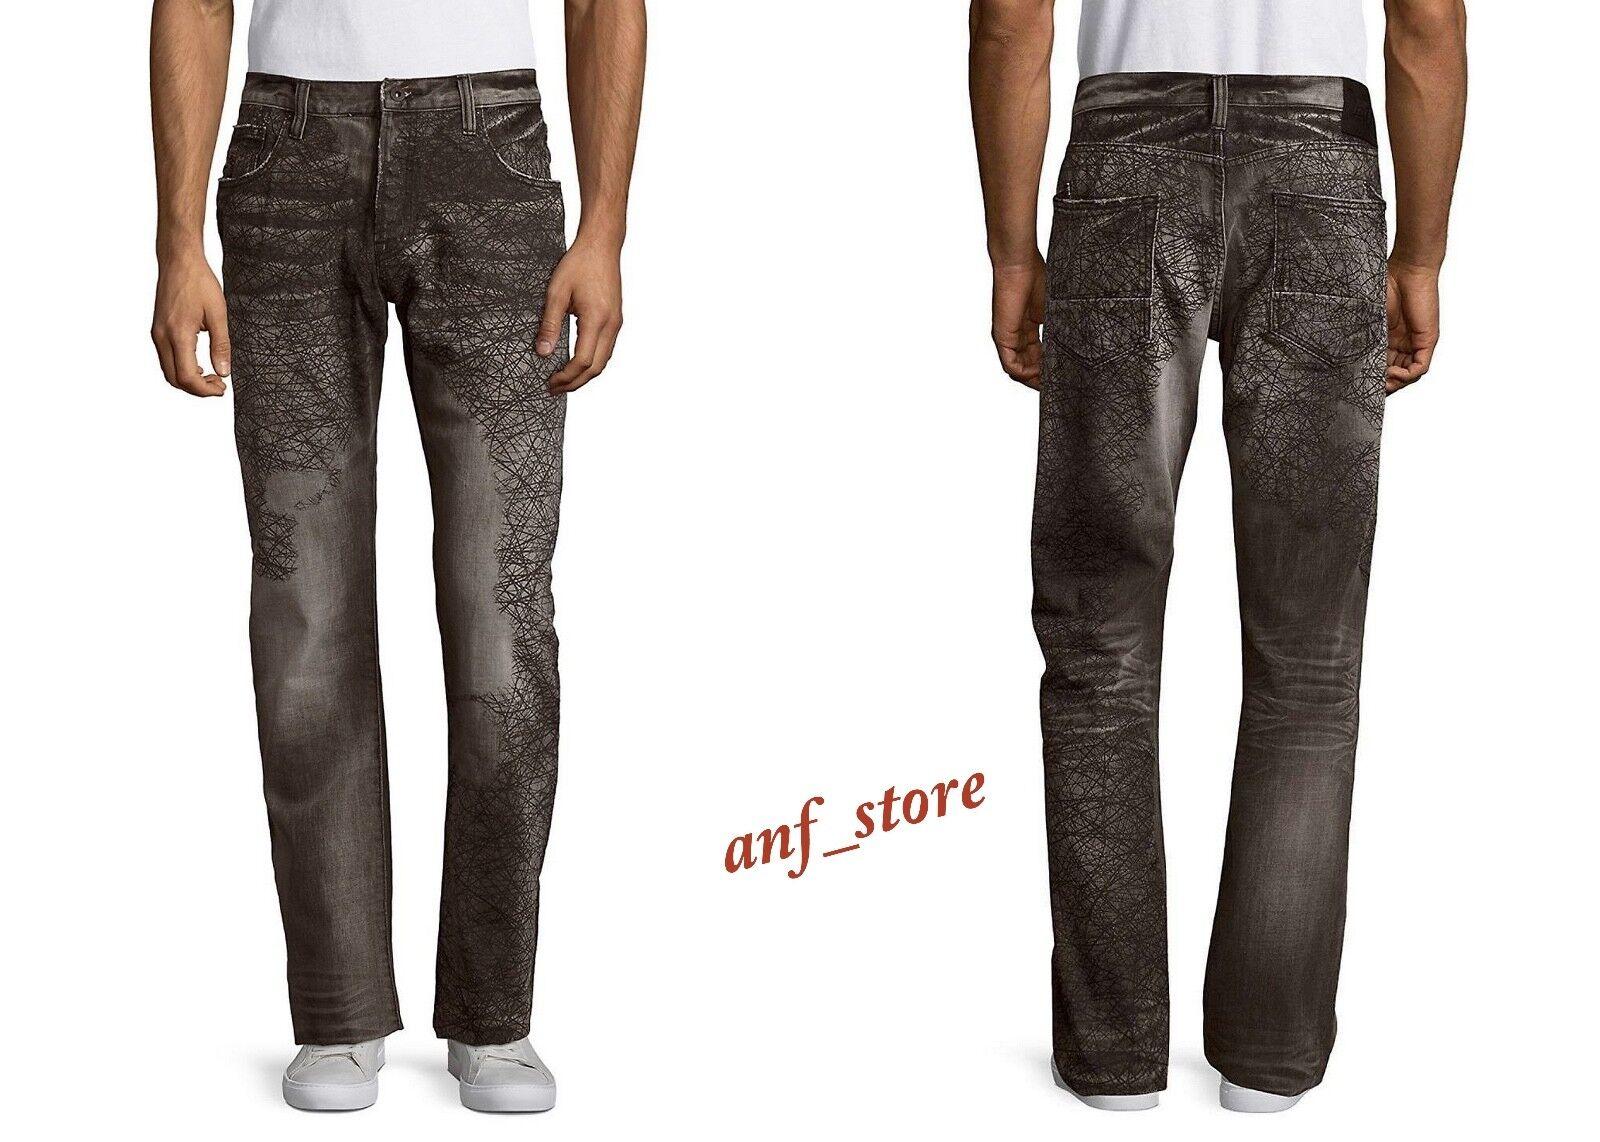 NWT PRPS Goods JAPAN Demon Slim Men Jeans 32 x 32 Faded DISTRESSED